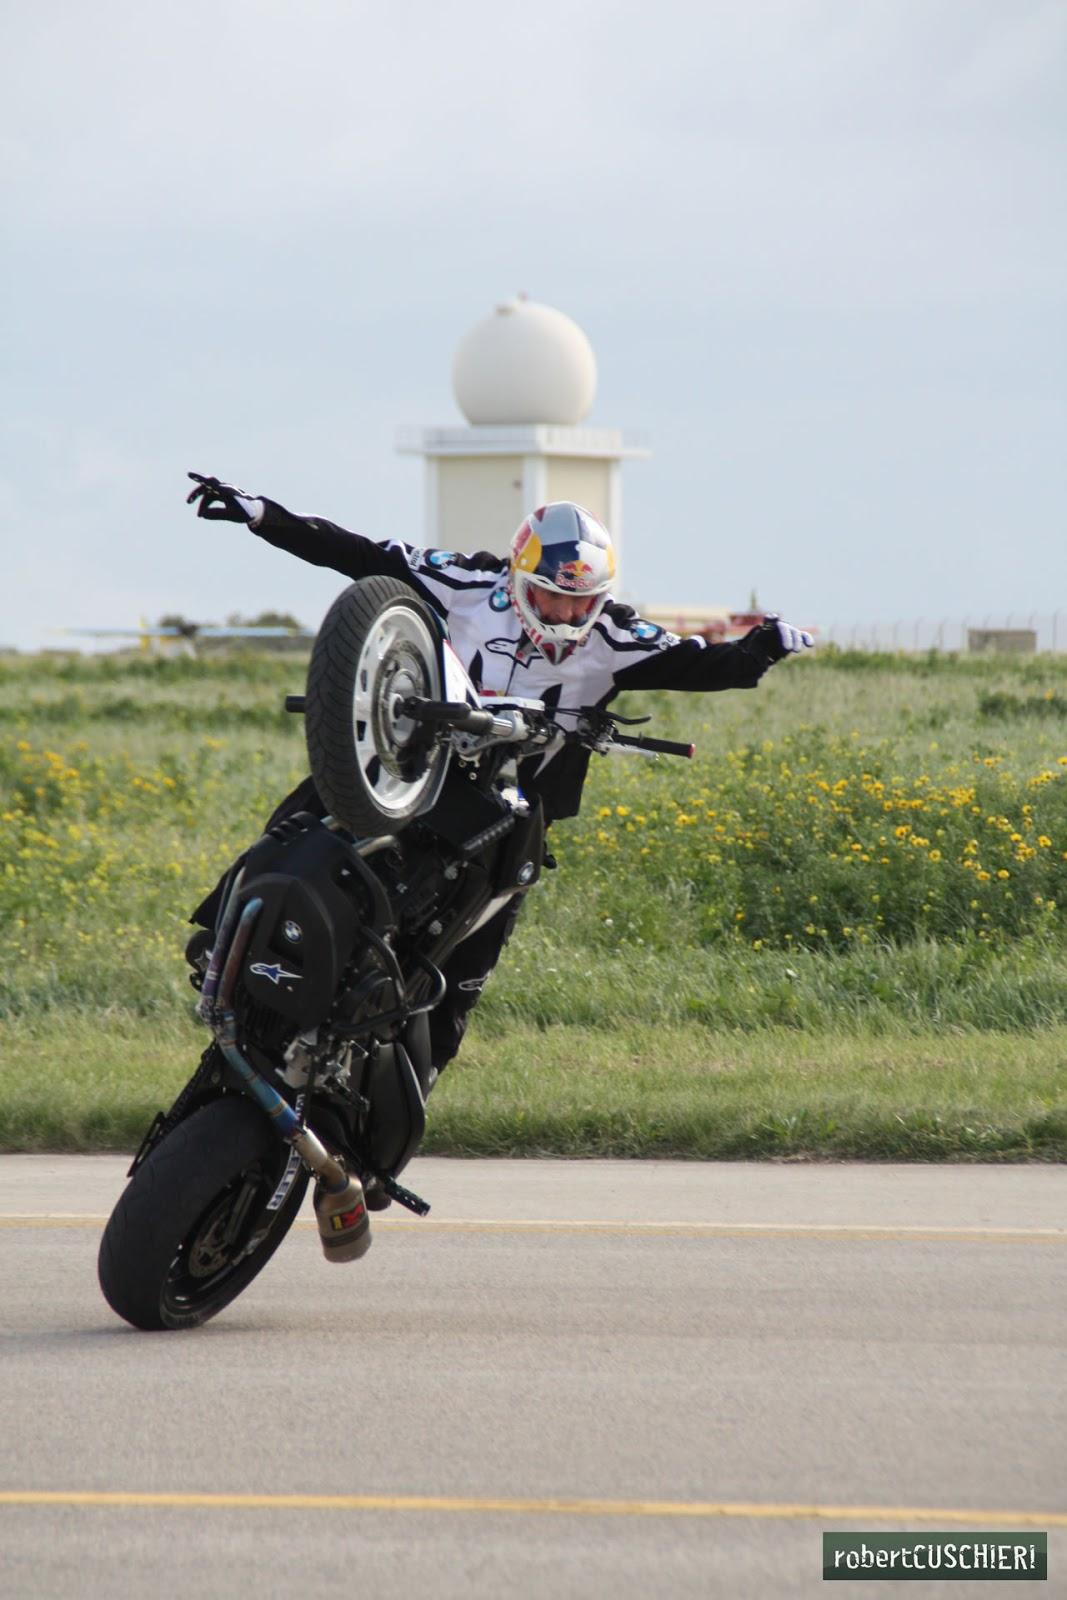 World Stunt Riding Champion Chris Pfeiffer